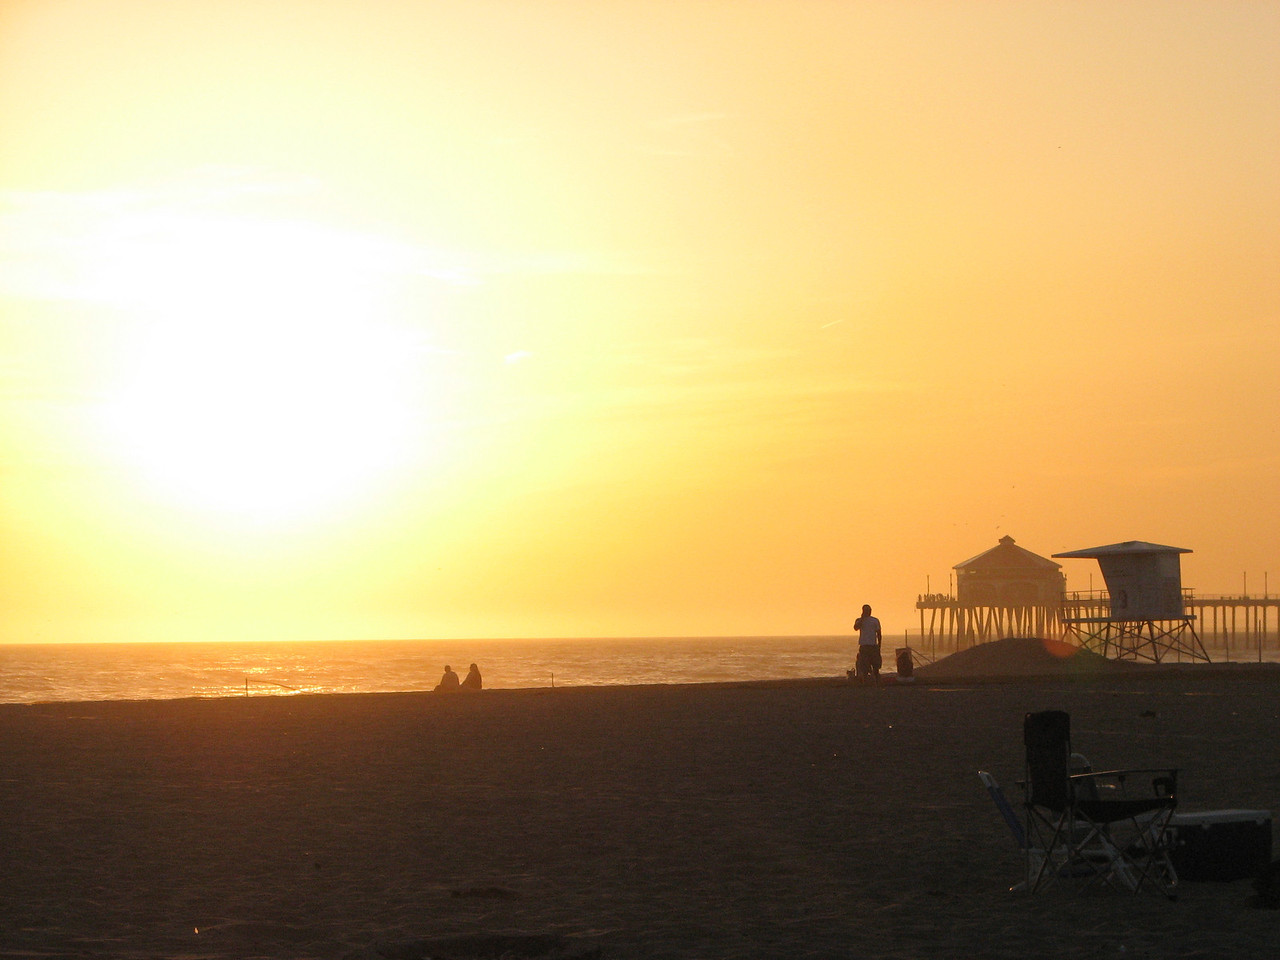 2008 03 24 Mon - Talbot & Int'l students @ the beach - Cali sunset